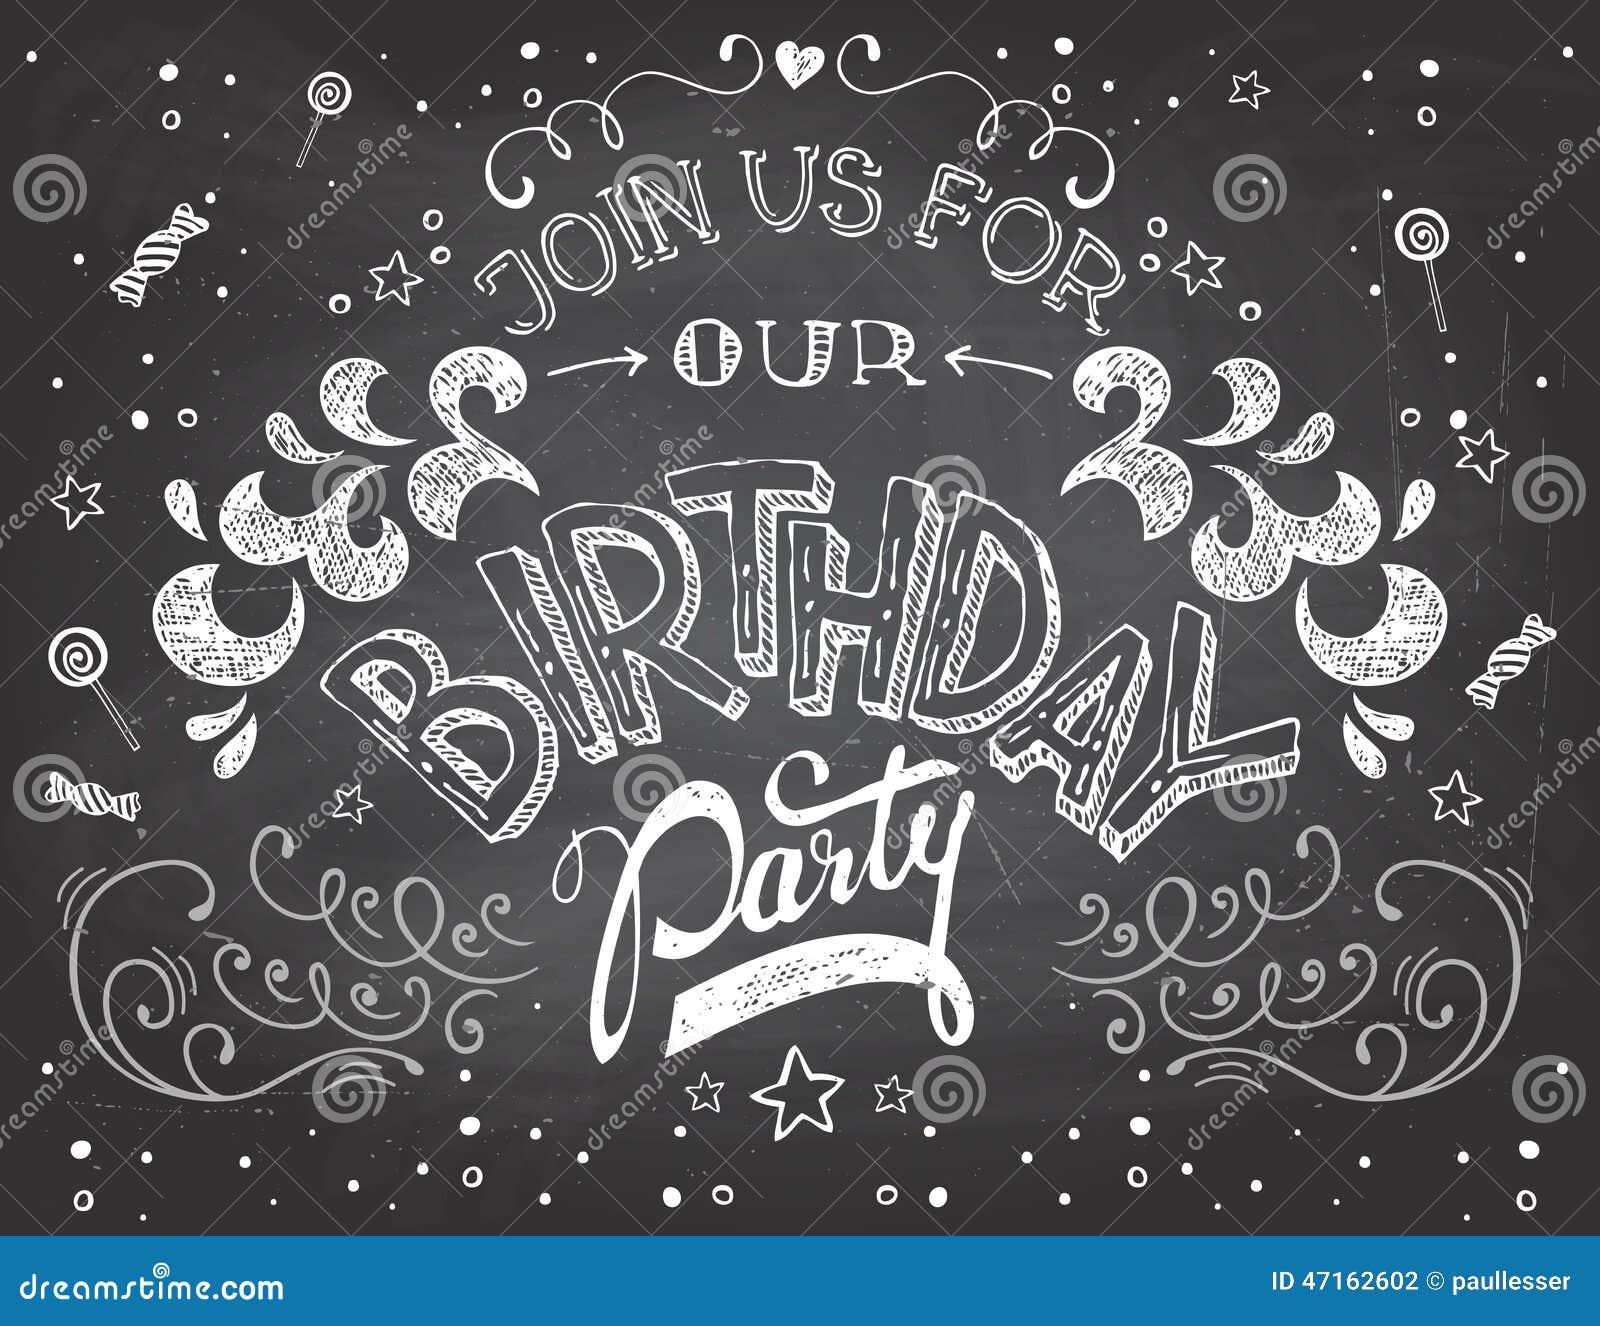 Birthday Party Invitation On Chalkboard Stock Vector ...